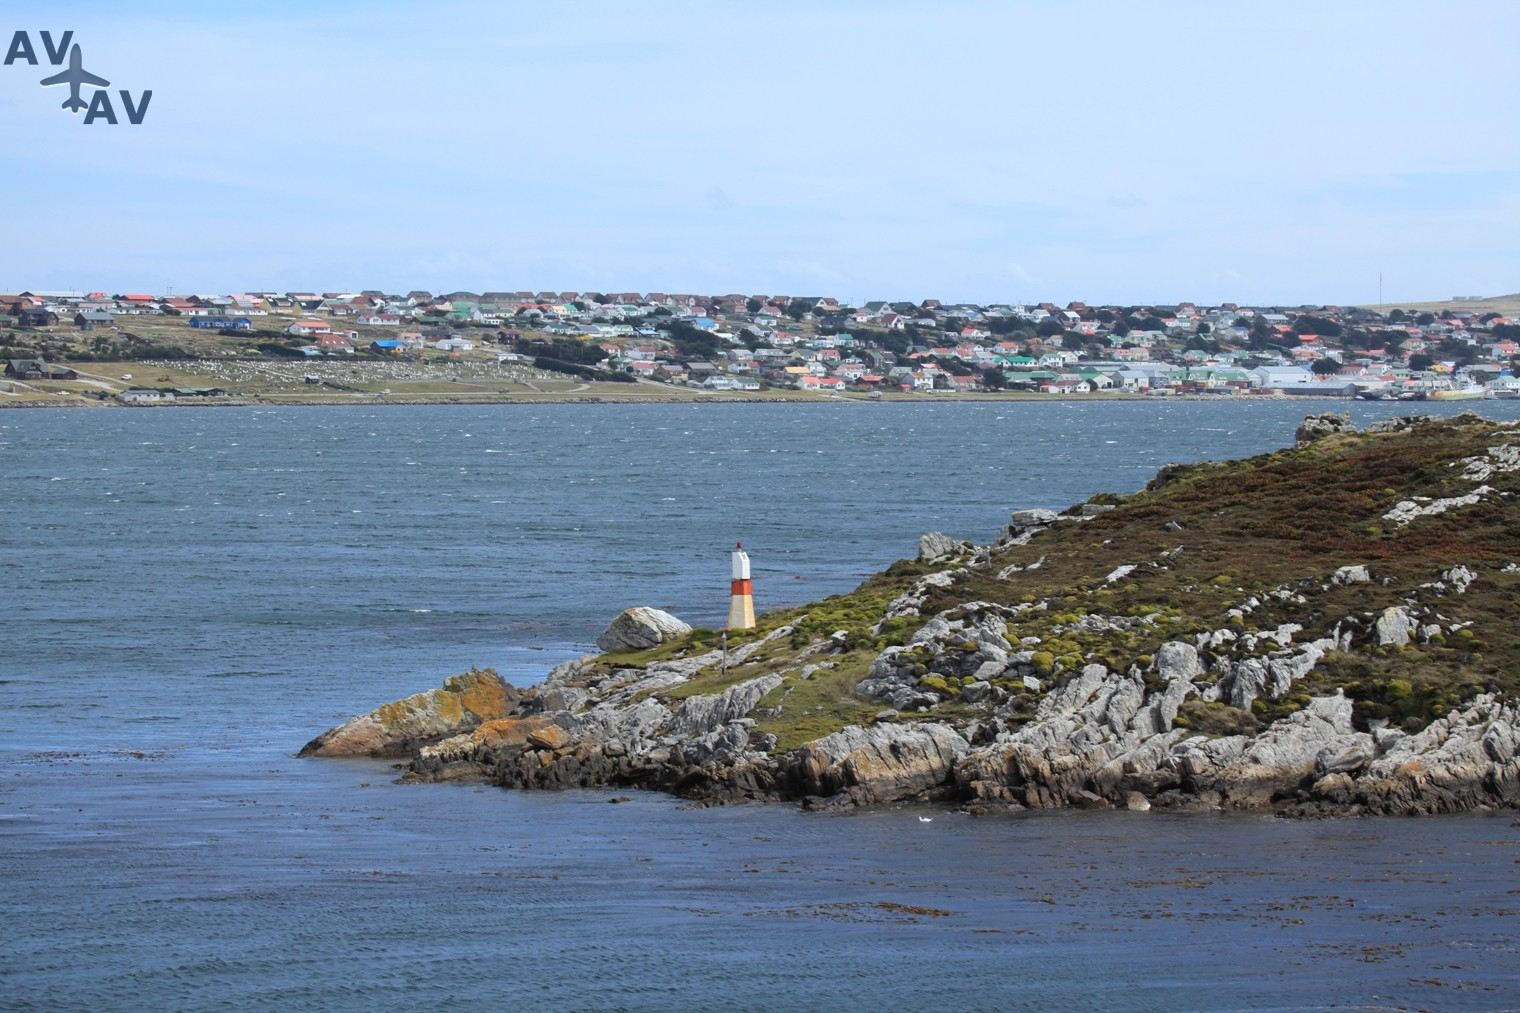 Folklendskie ostrova kolyibel prirodyi - Фолклендские острова - колыбель природы